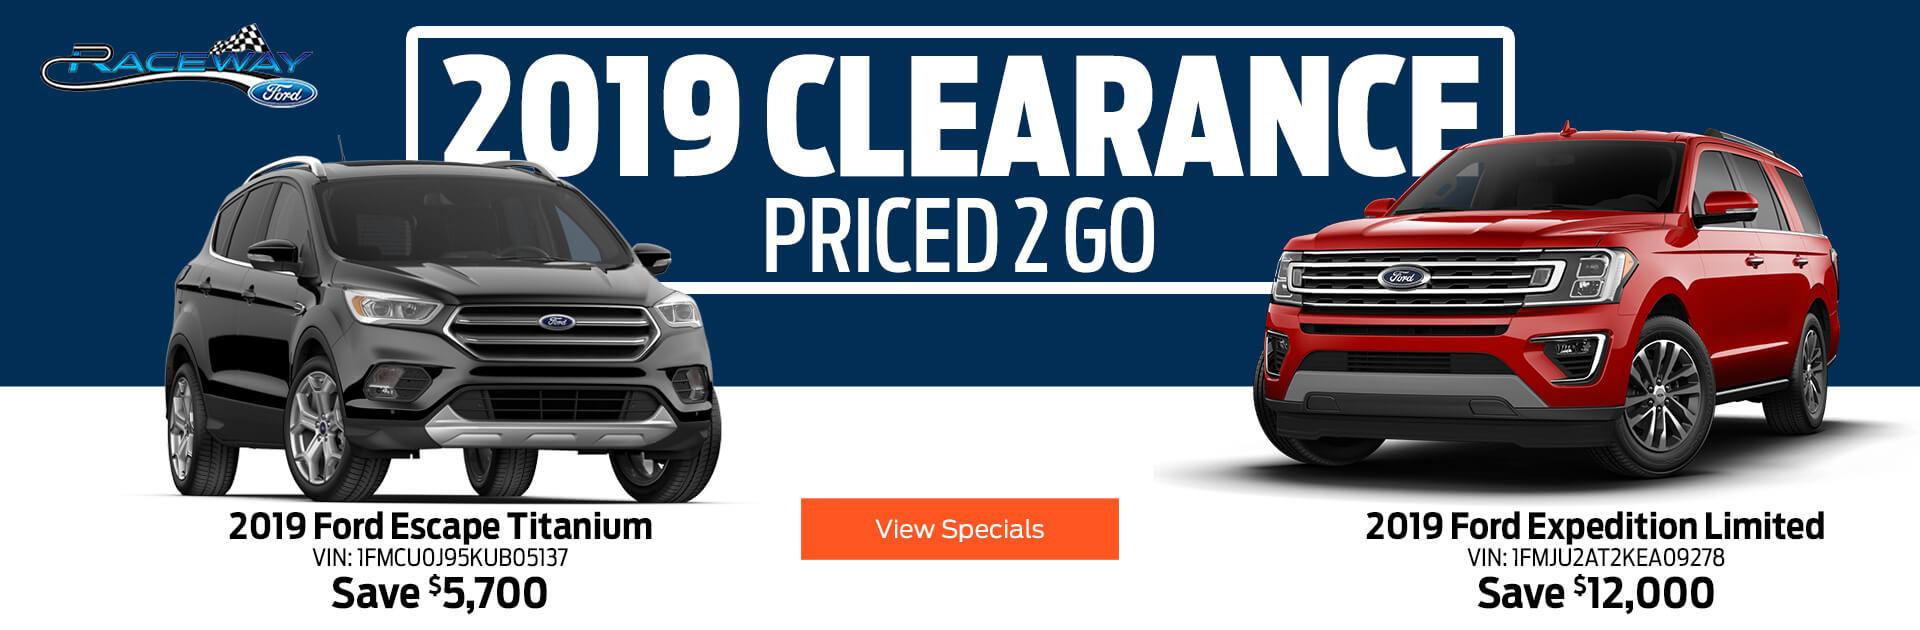 2019 Clearance Sale 1